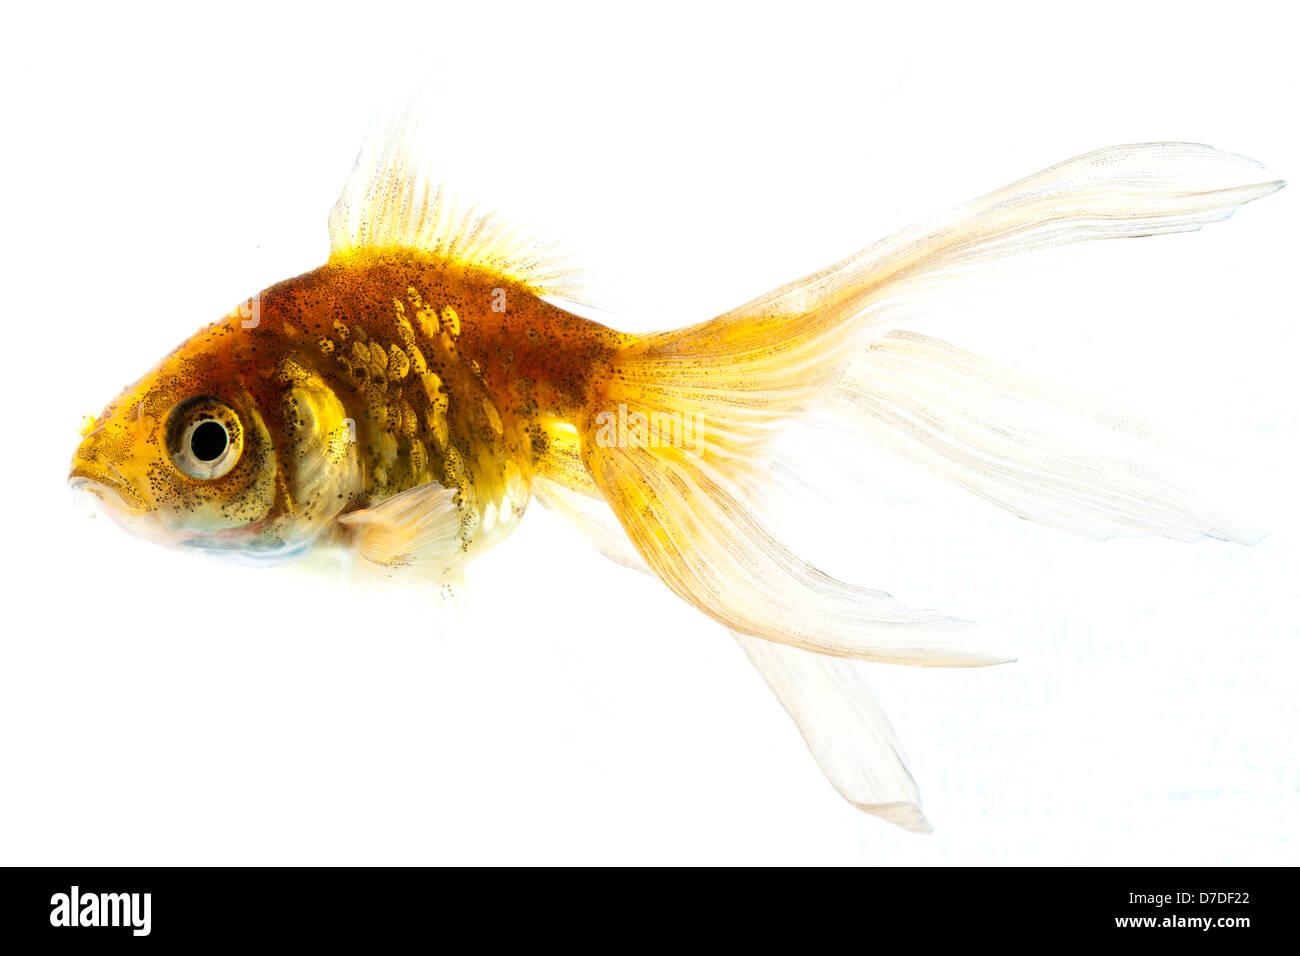 Veiltail Goldfish | Veiltail Goldfish Carassius Sp Stock Photo 56230890 Alamy